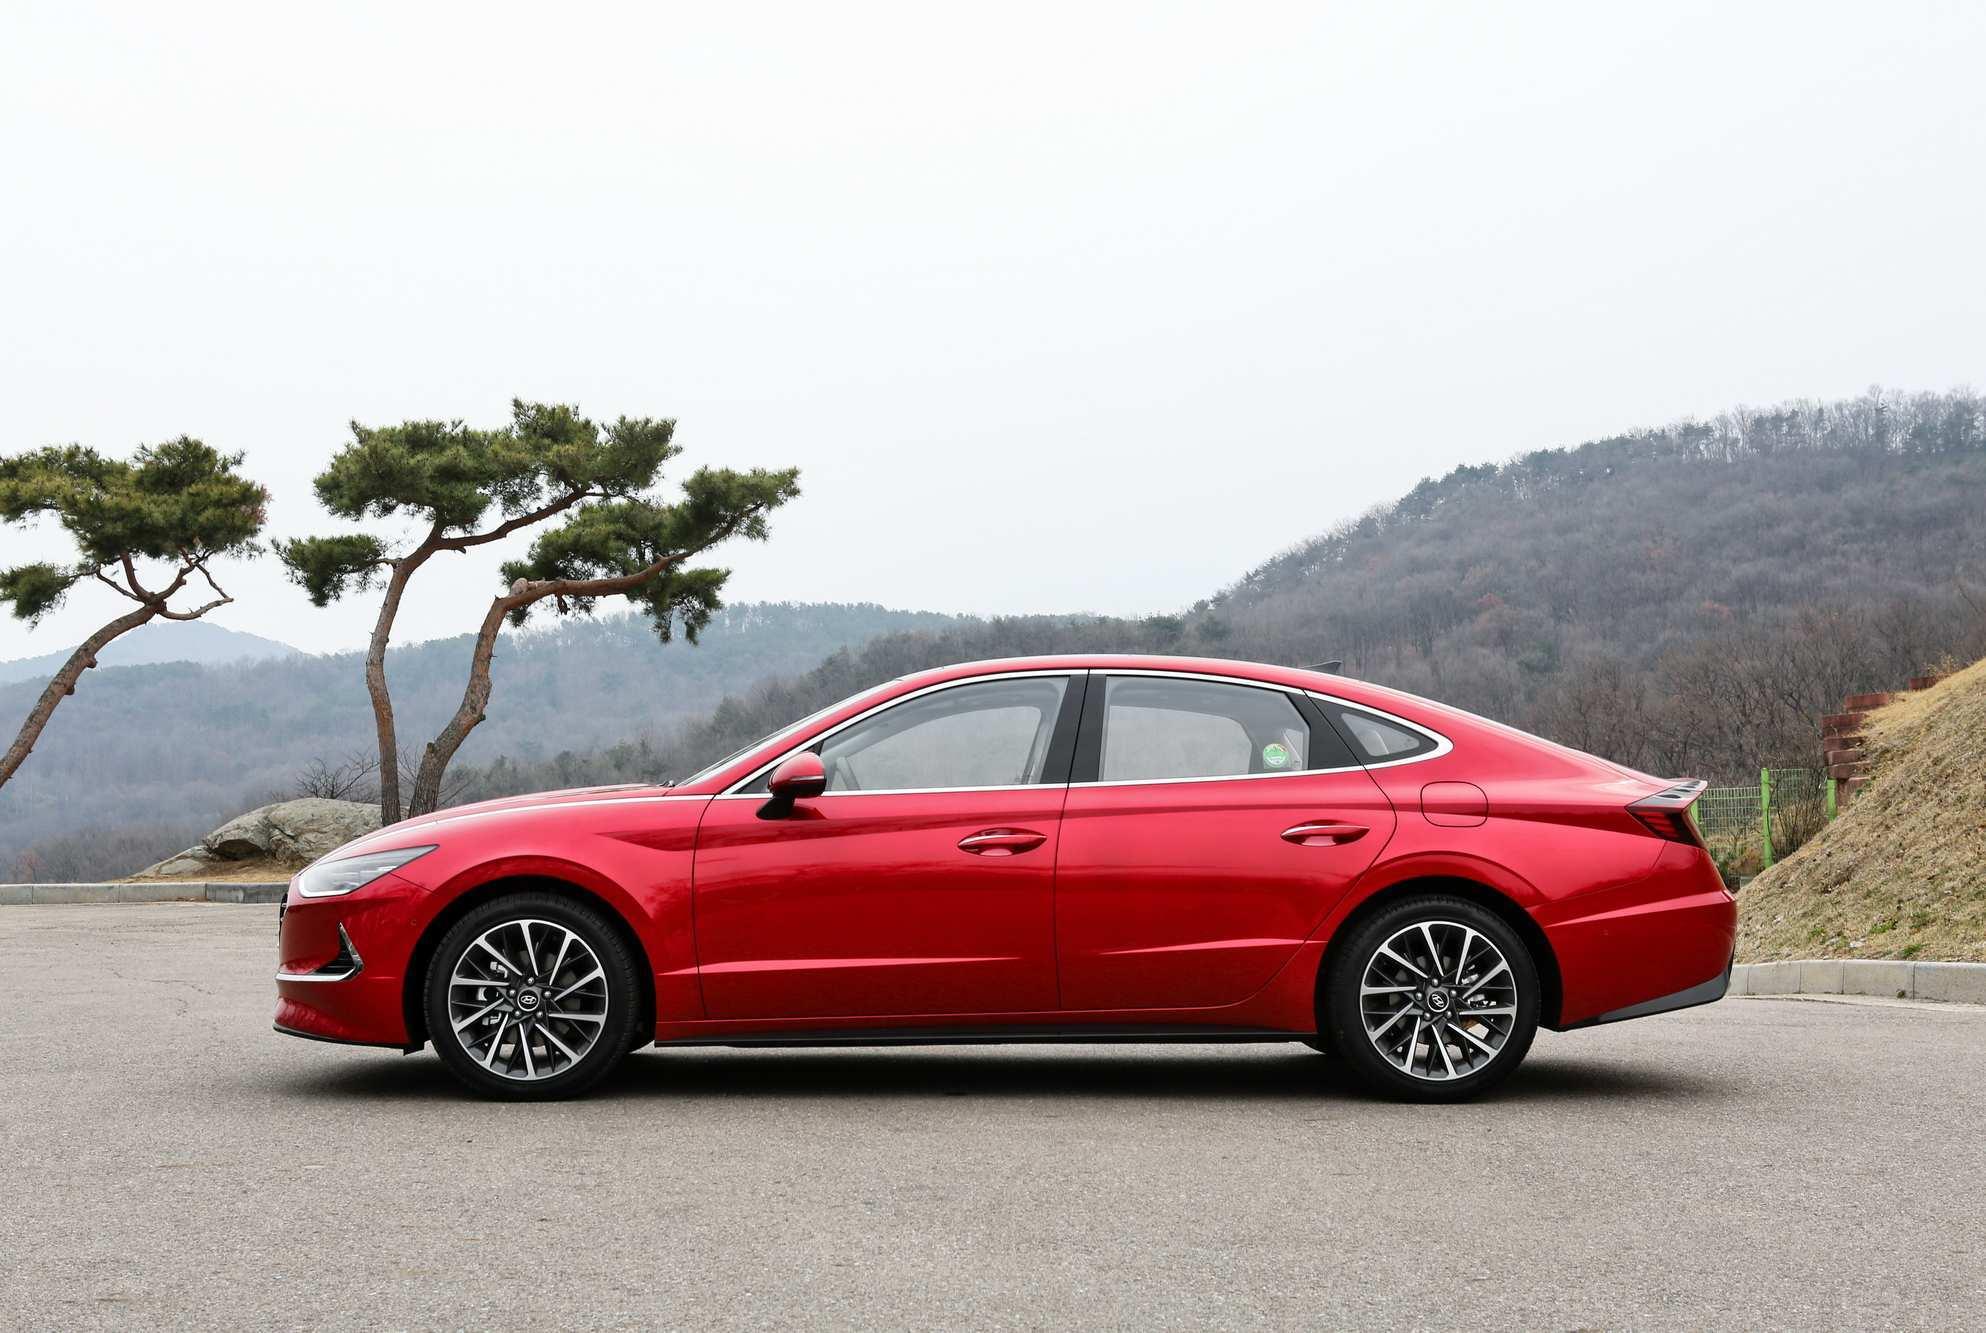 43 New When Will The 2020 Hyundai Sonata Be Available Specs by When Will The 2020 Hyundai Sonata Be Available